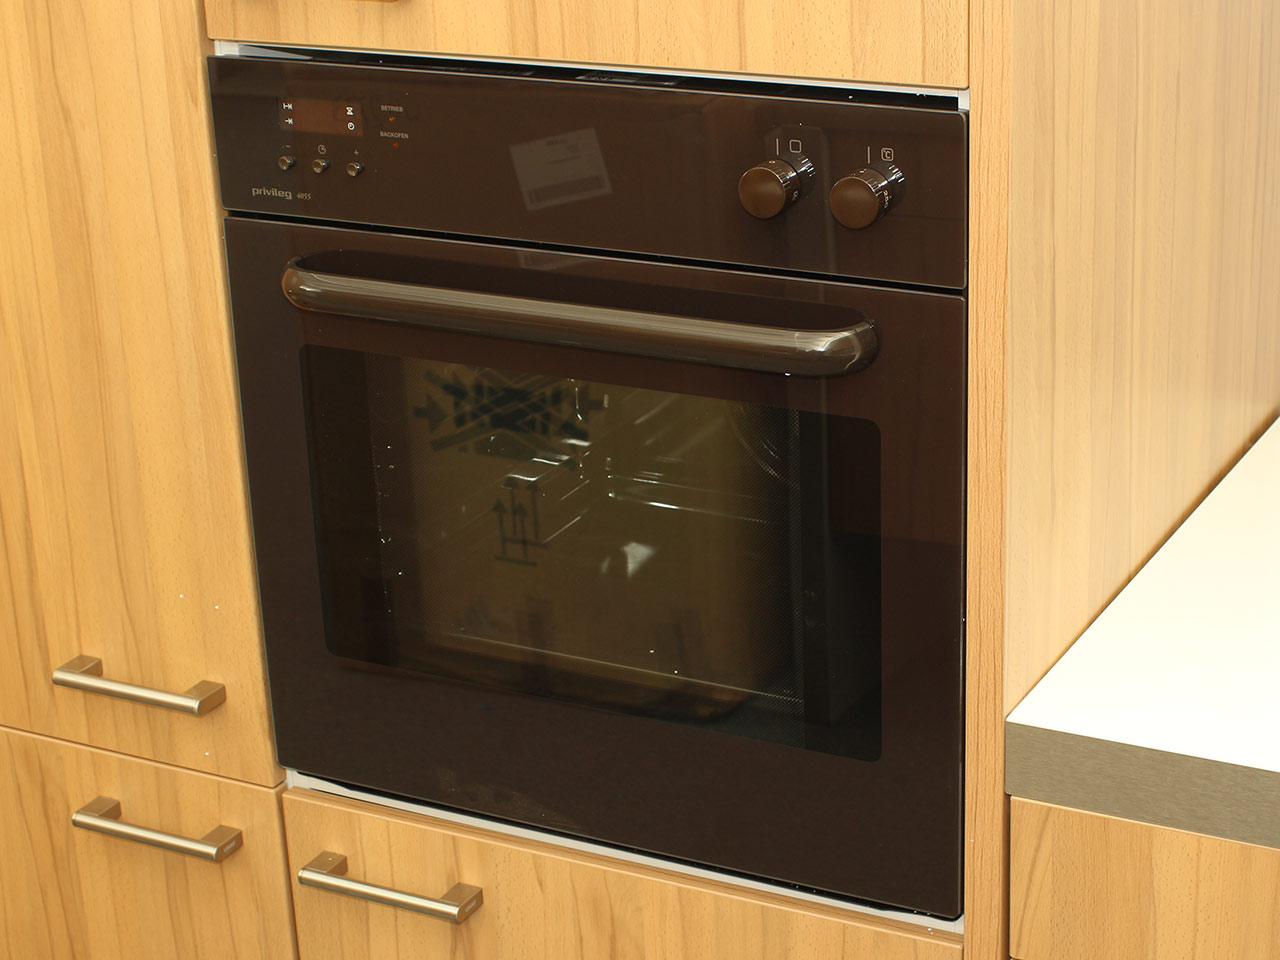 privileg backofen eb 4055 eek a autark braune front 5. Black Bedroom Furniture Sets. Home Design Ideas